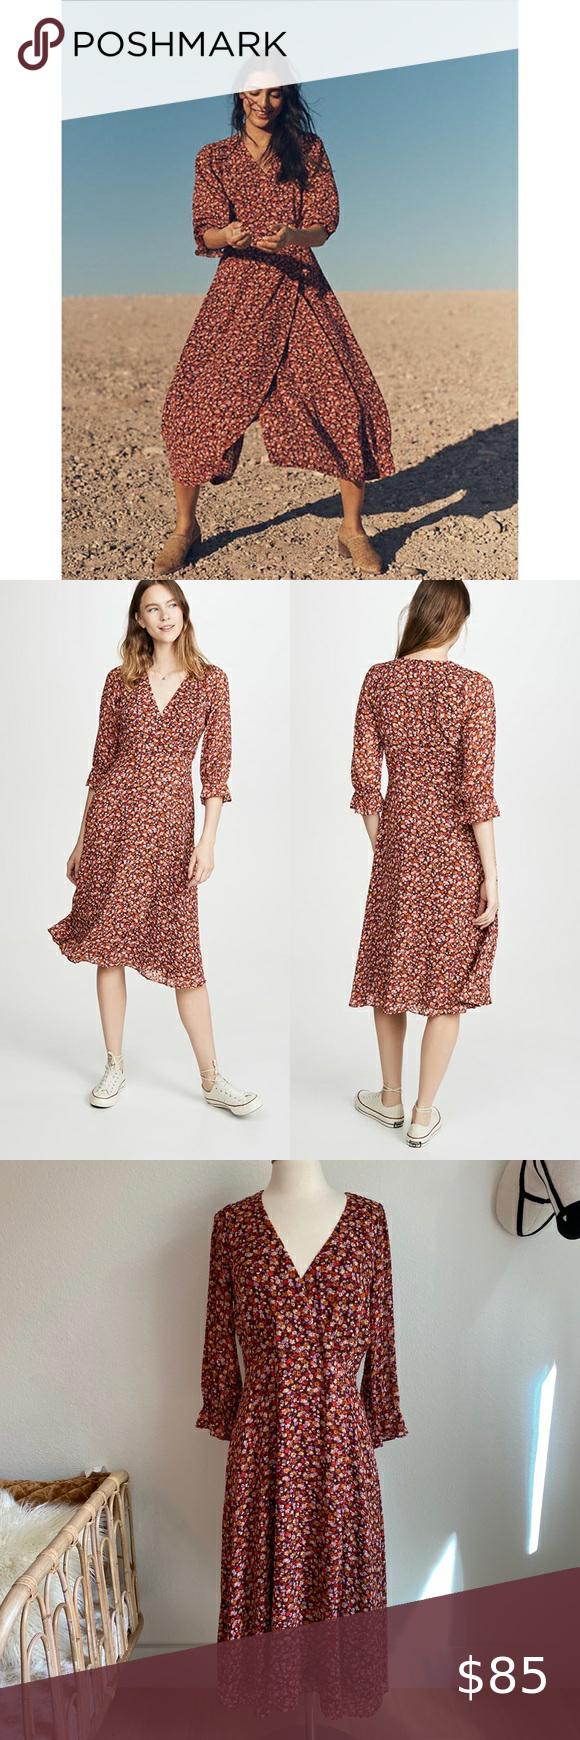 Madewell Ruffle Sleeve Crossover Midi Dress Midi Dress Ruffle Sleeve Spring Dresses [ 1740 x 580 Pixel ]